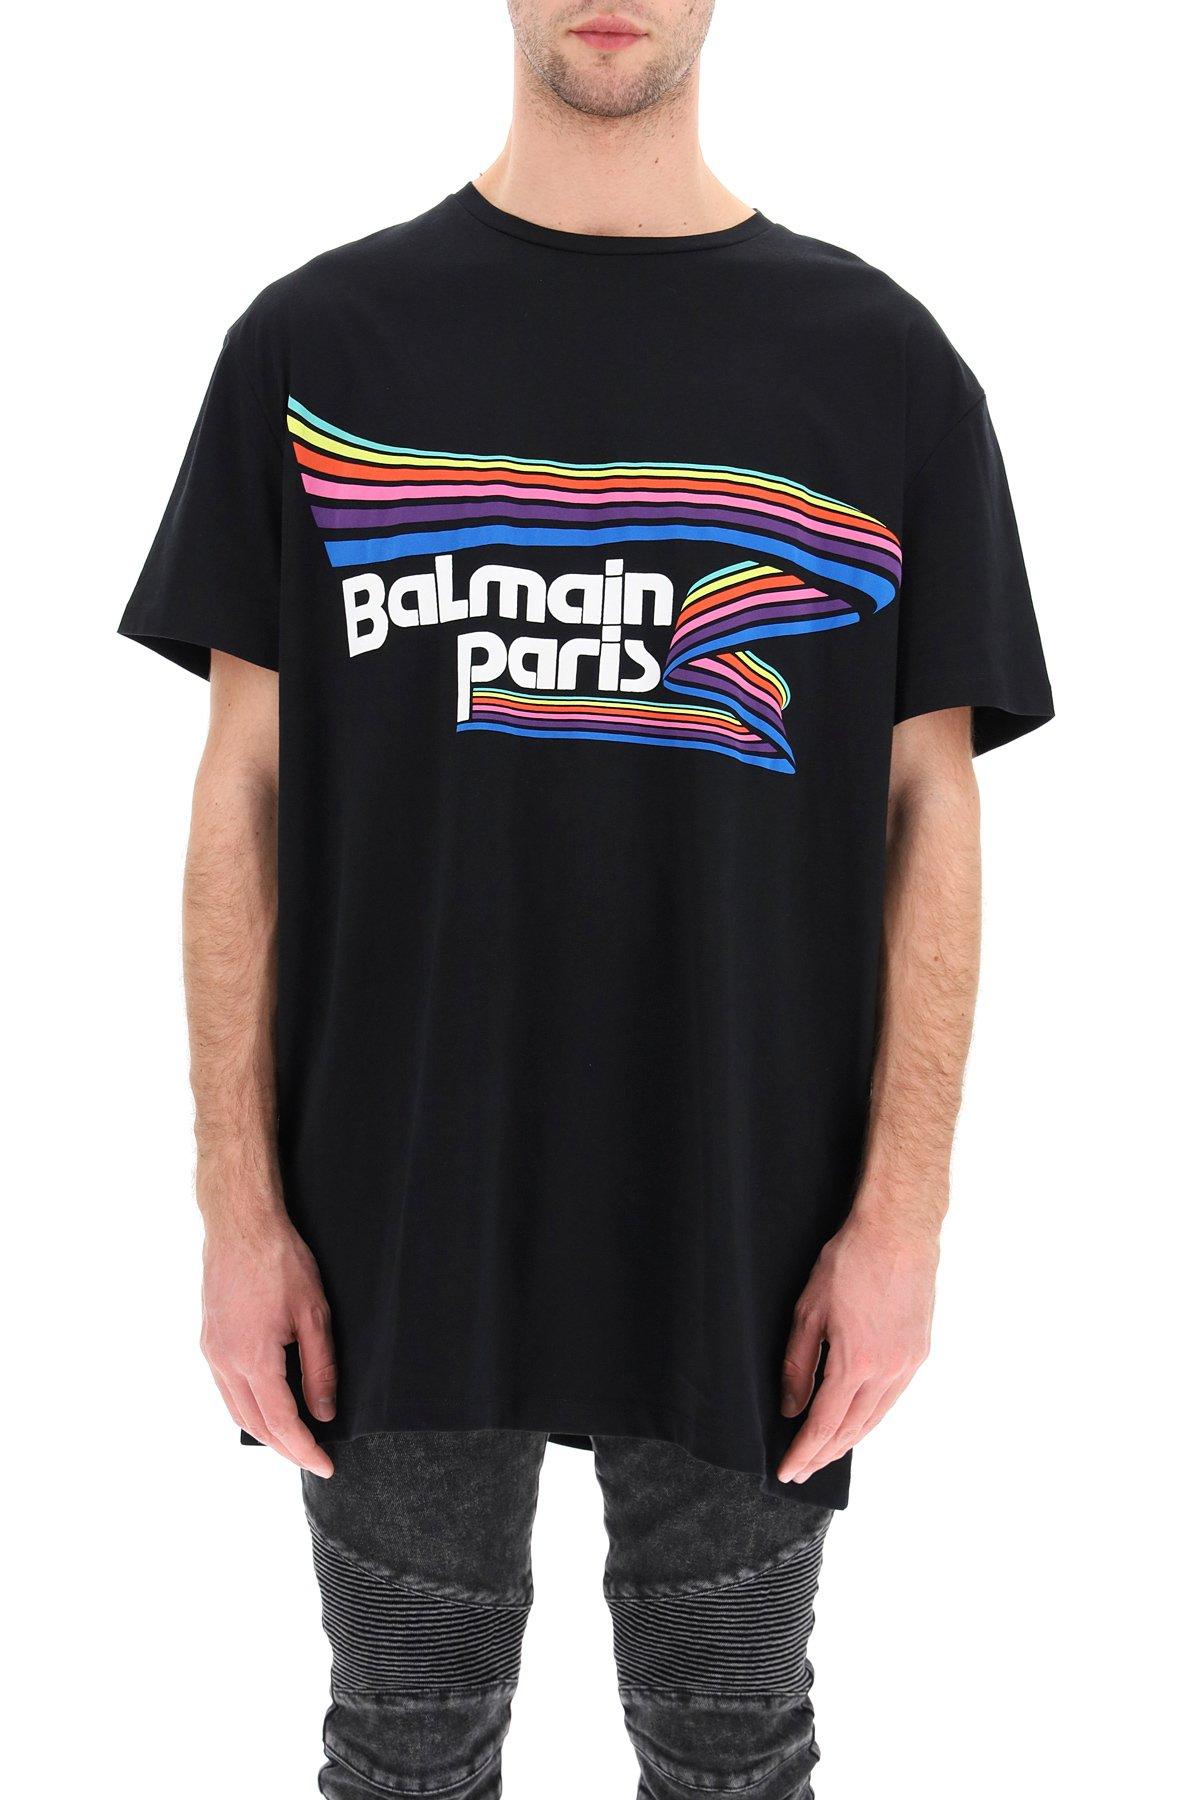 Balmain t-shirt stampa logo flock rubber multicolor